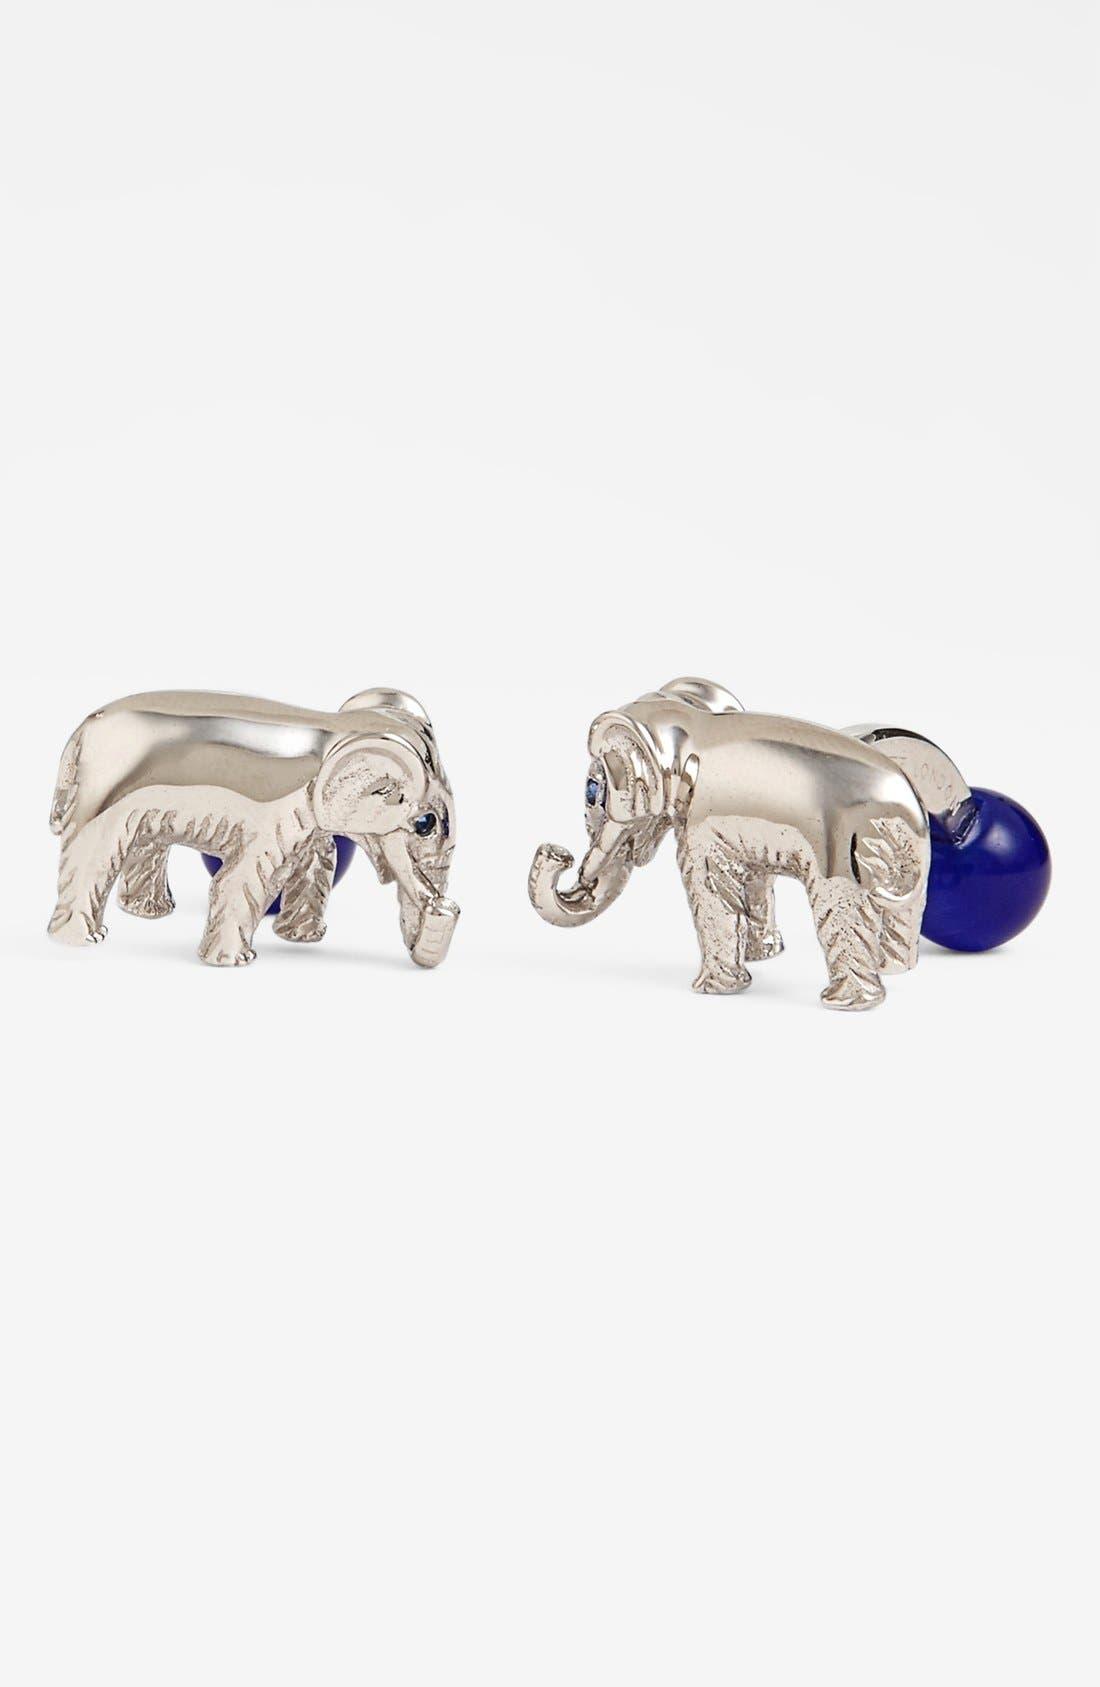 Main Image - Tateossian 'Elephant' Cuff Links